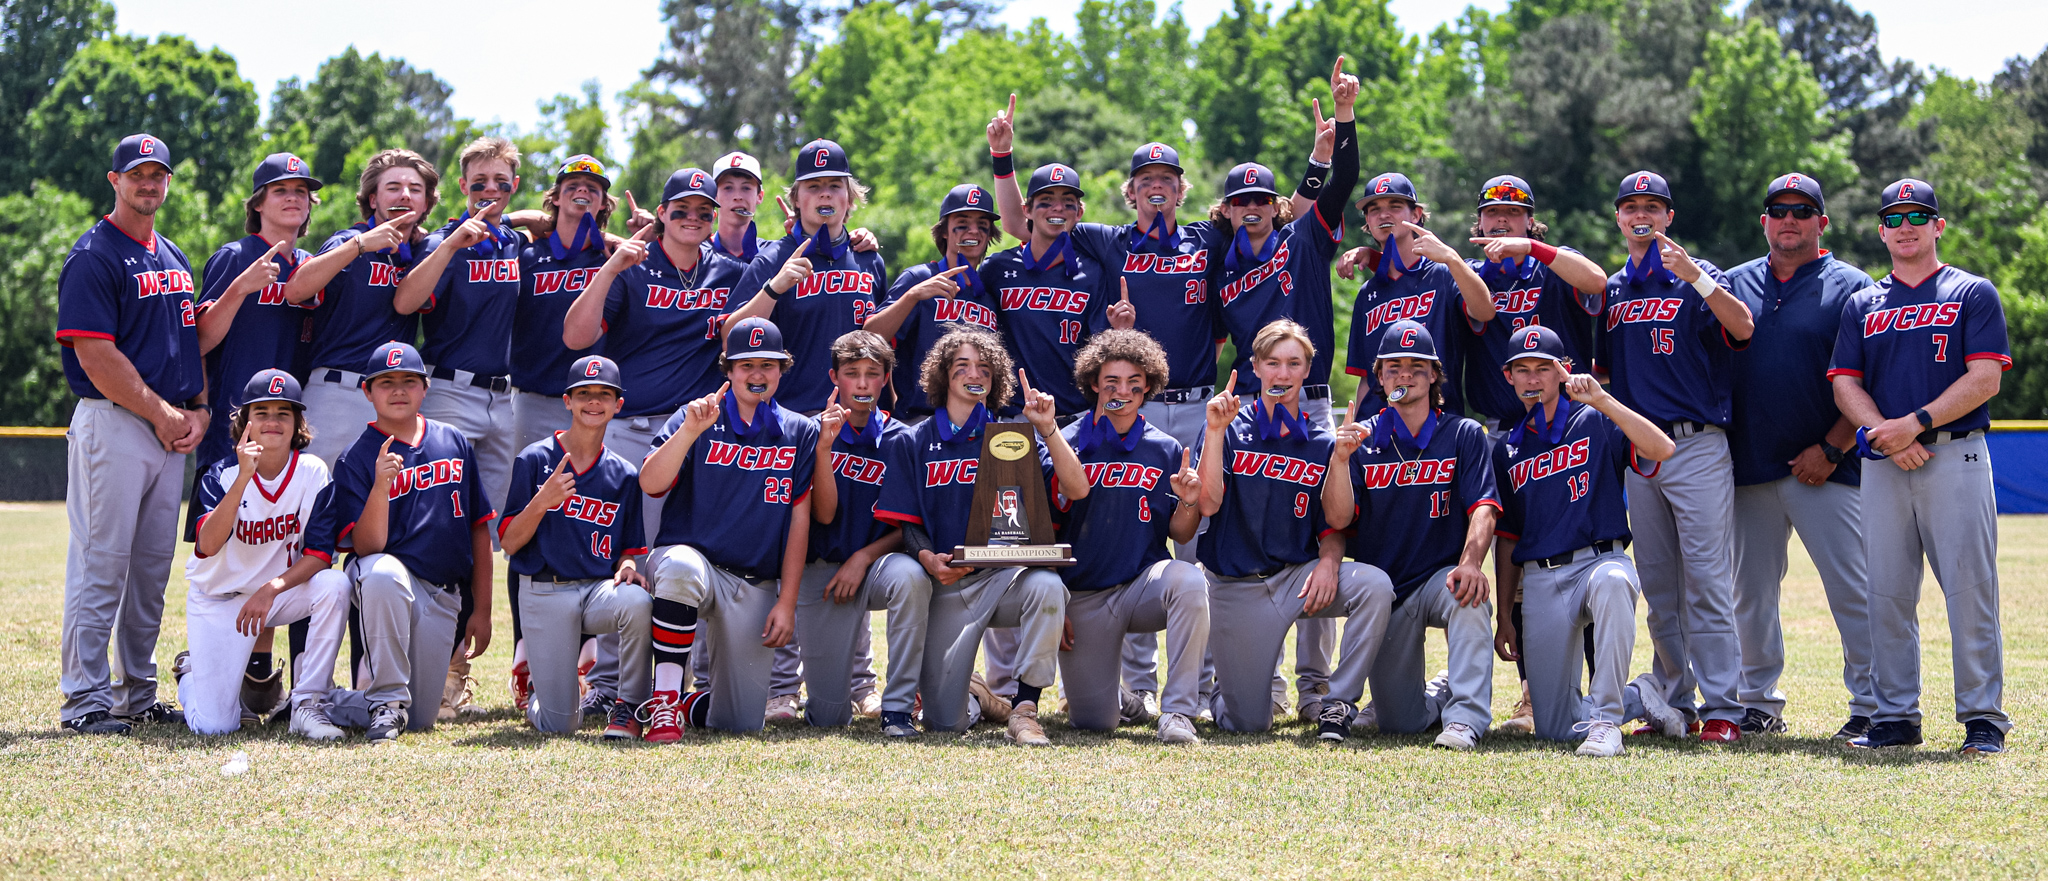 Baseball: WCDS Wins NCISAA 2A State Championship (PHOTO GALLERY)